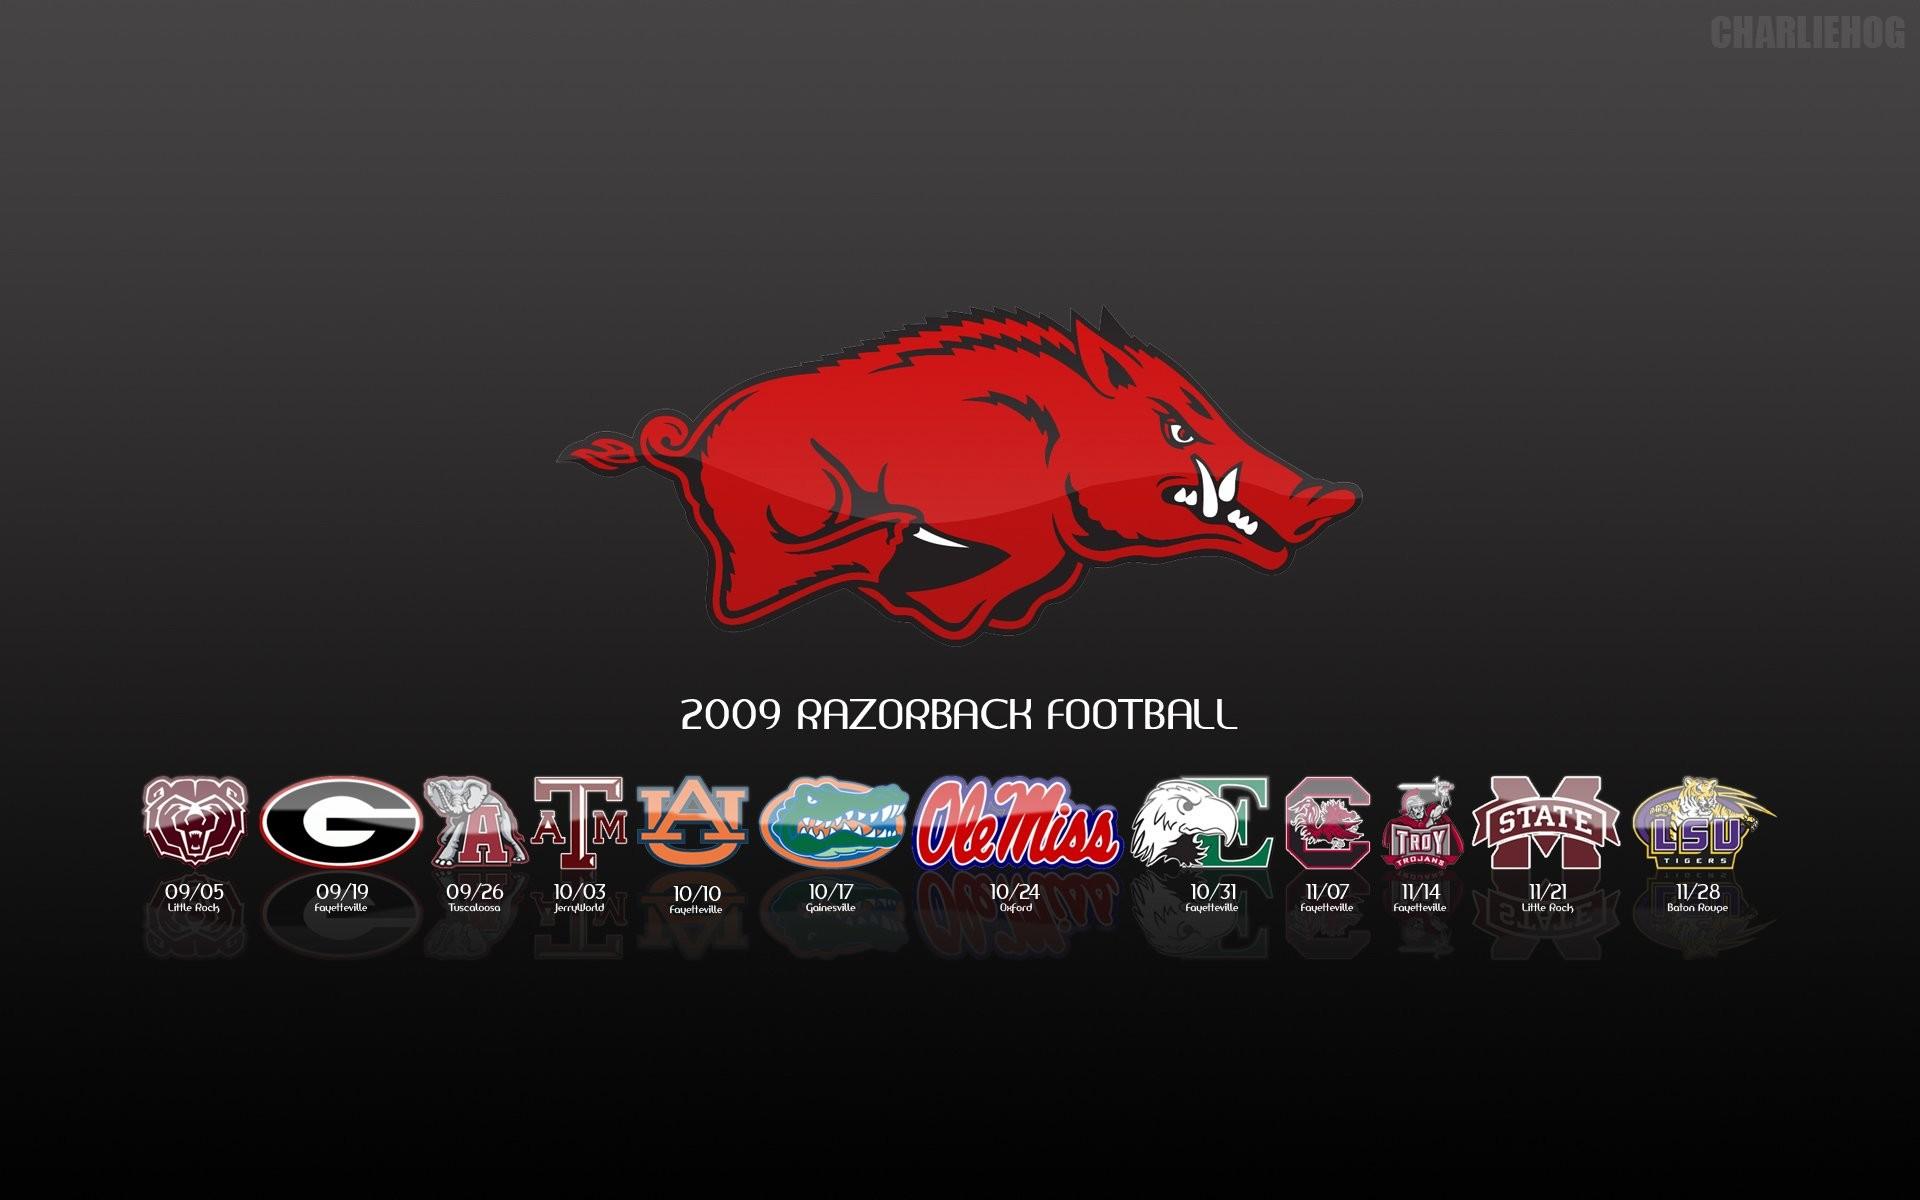 ARKANSAS RAZORBACKS college football wallpaper background by .